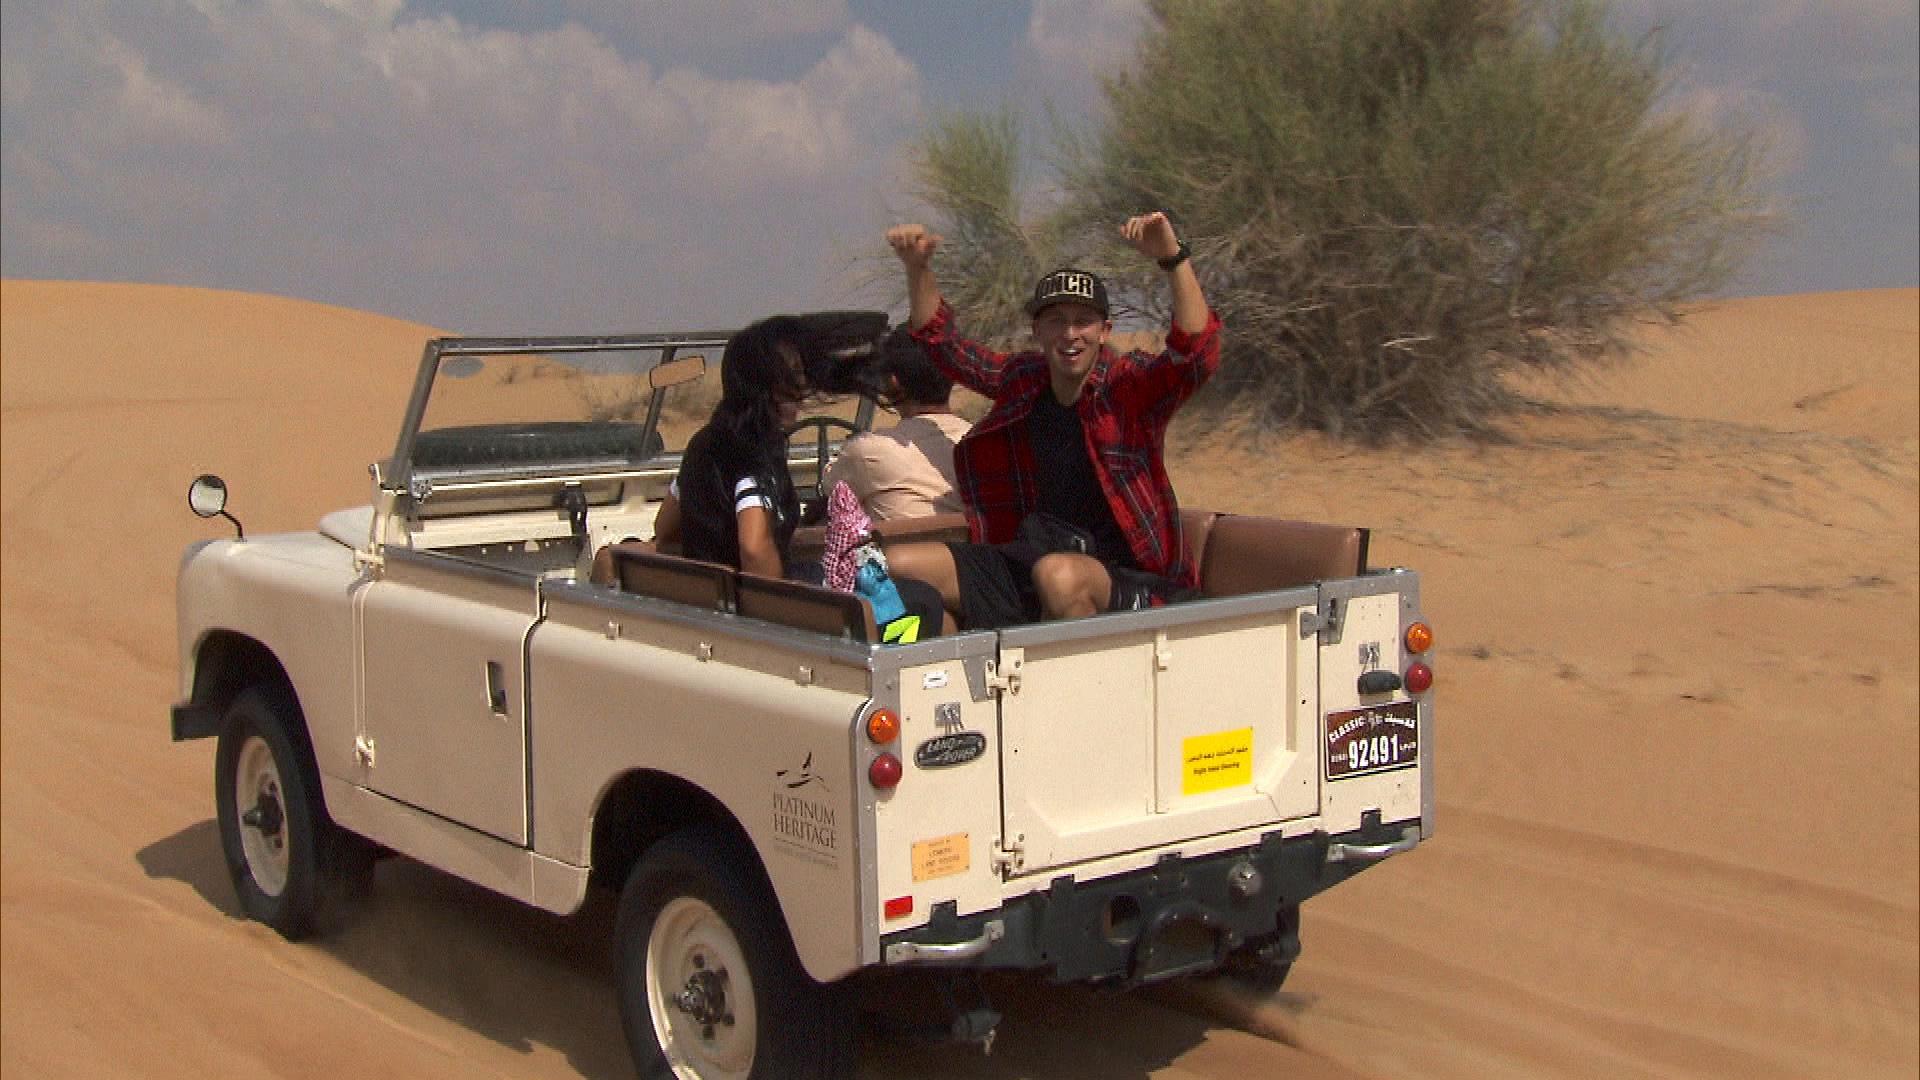 Matt and Dana take a ride in the desert toward Detour A.